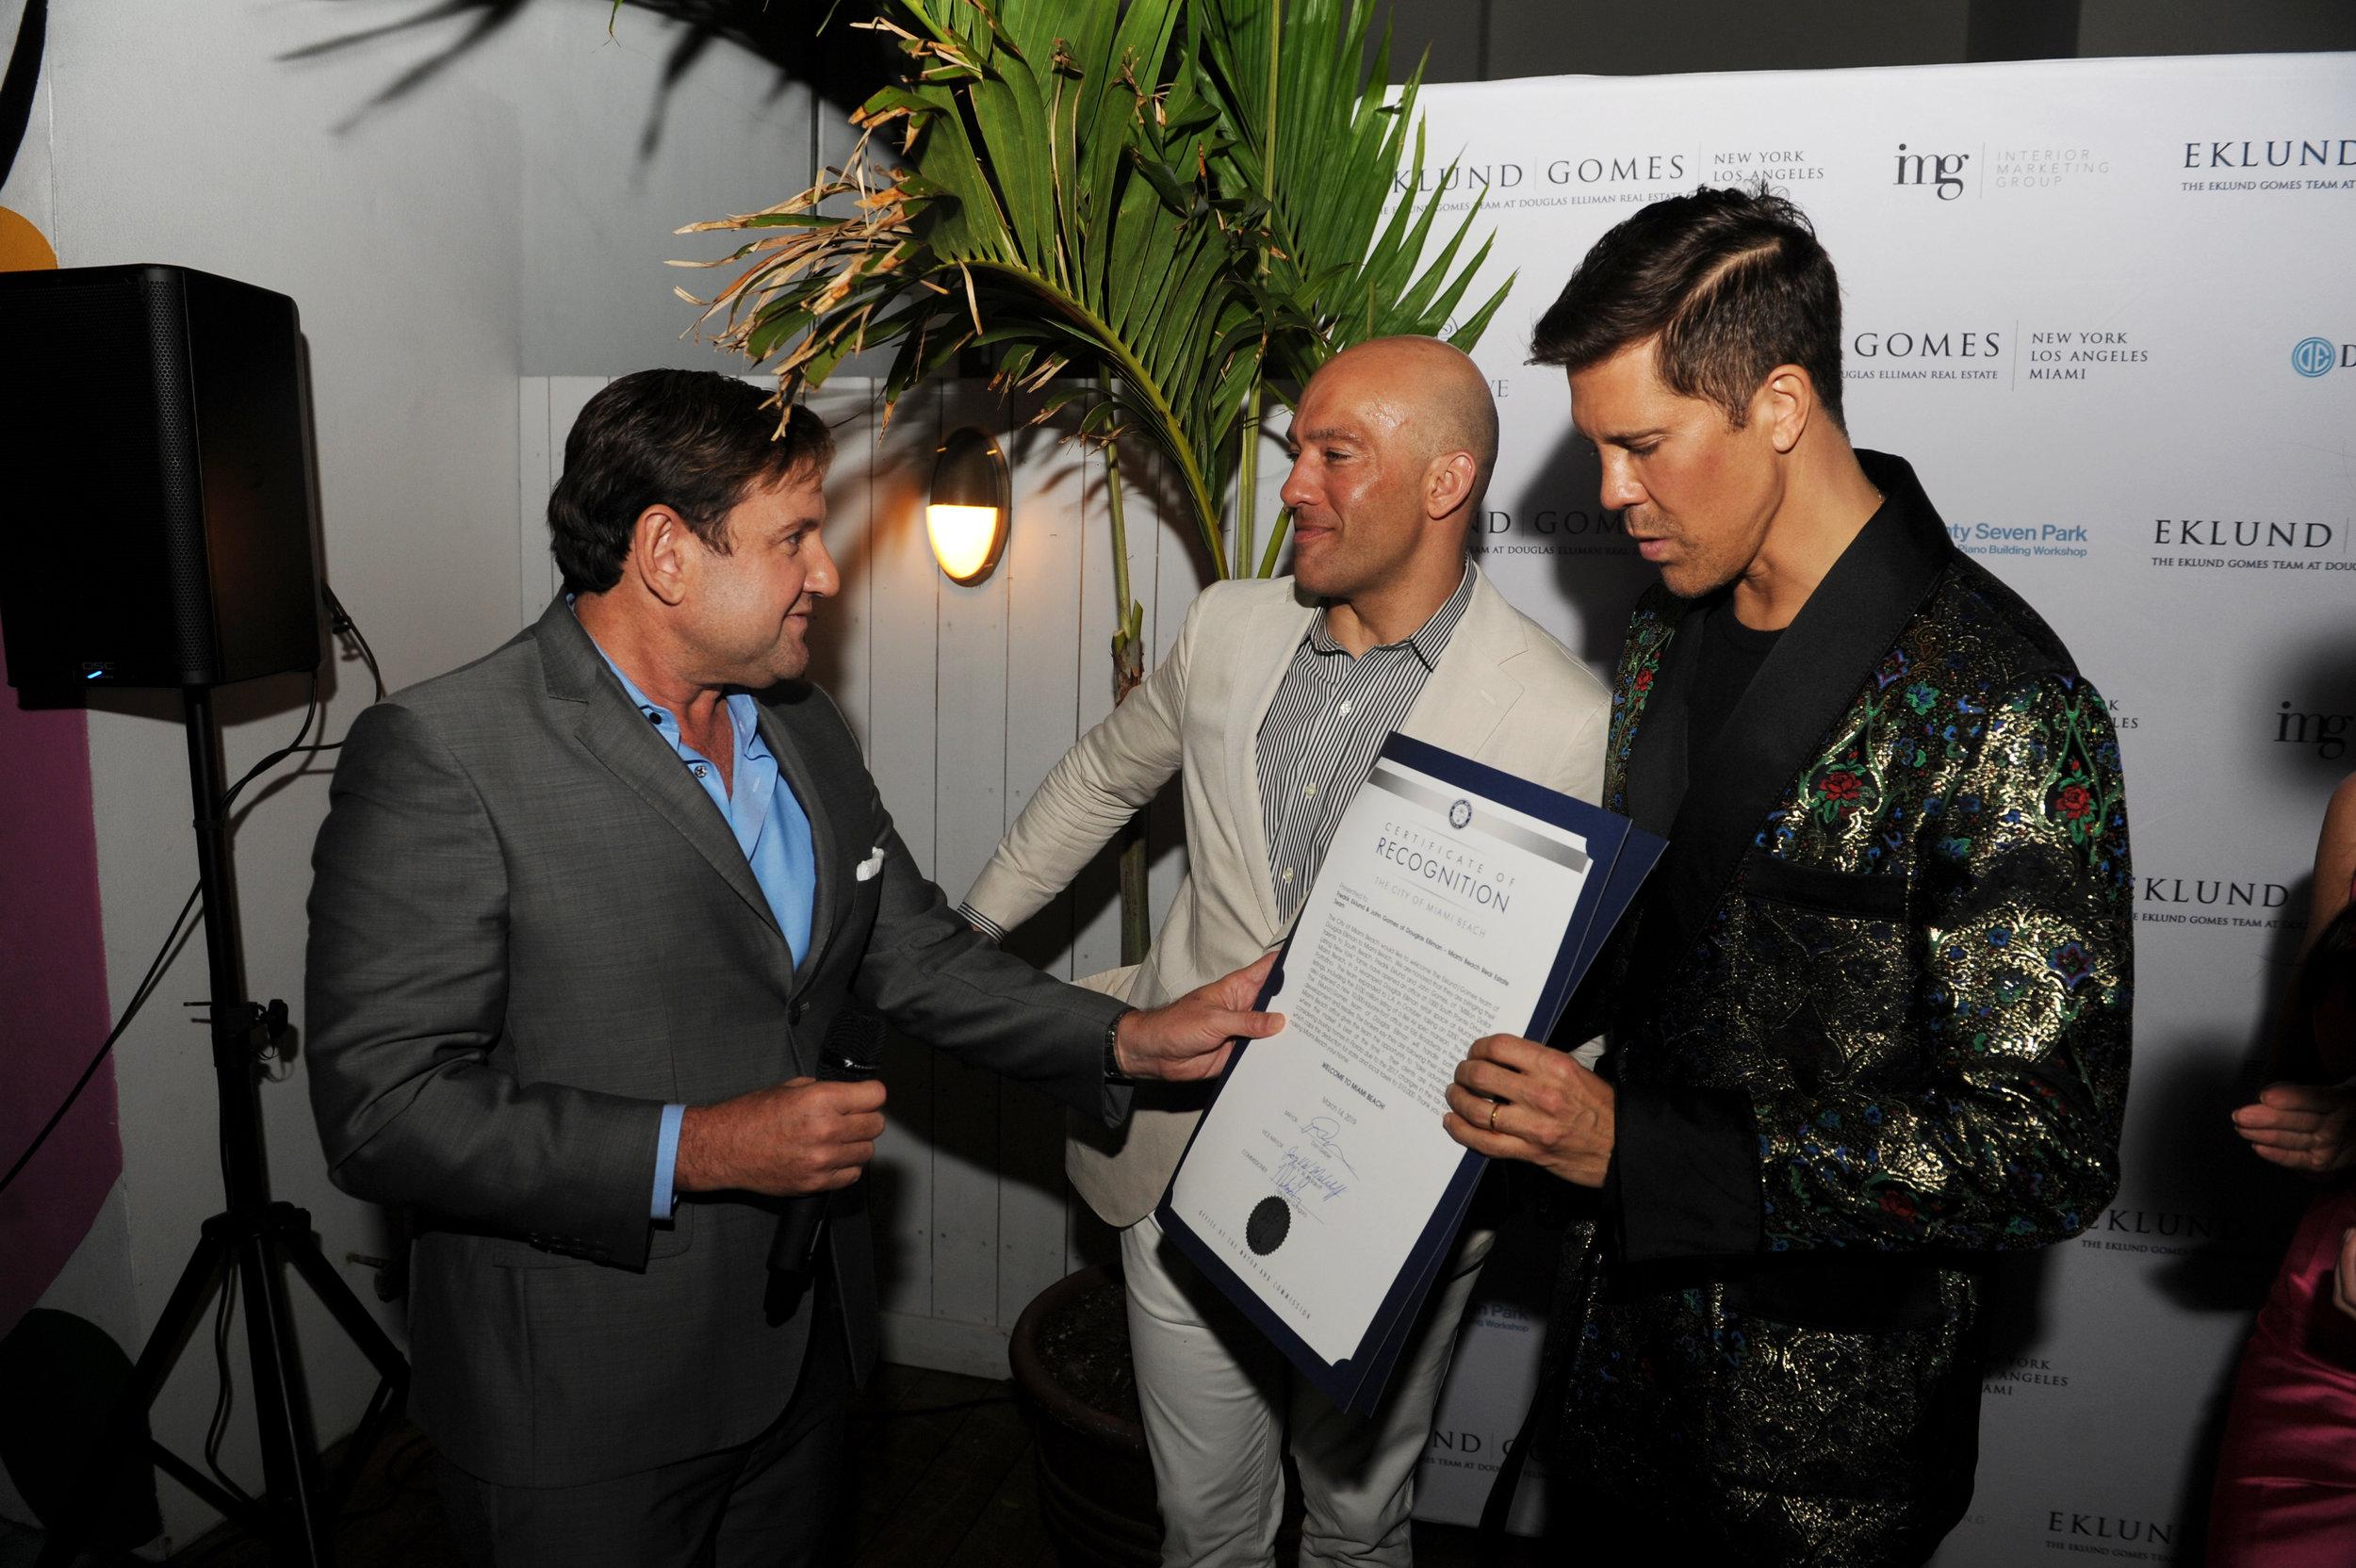 Michael Gongora, John Gomes, Fredrik Eklund Speaking Bravo's Million Dollar Listing Star Fredrik Eklund & John Gomes Launch Miami Team With Douglas Elliman